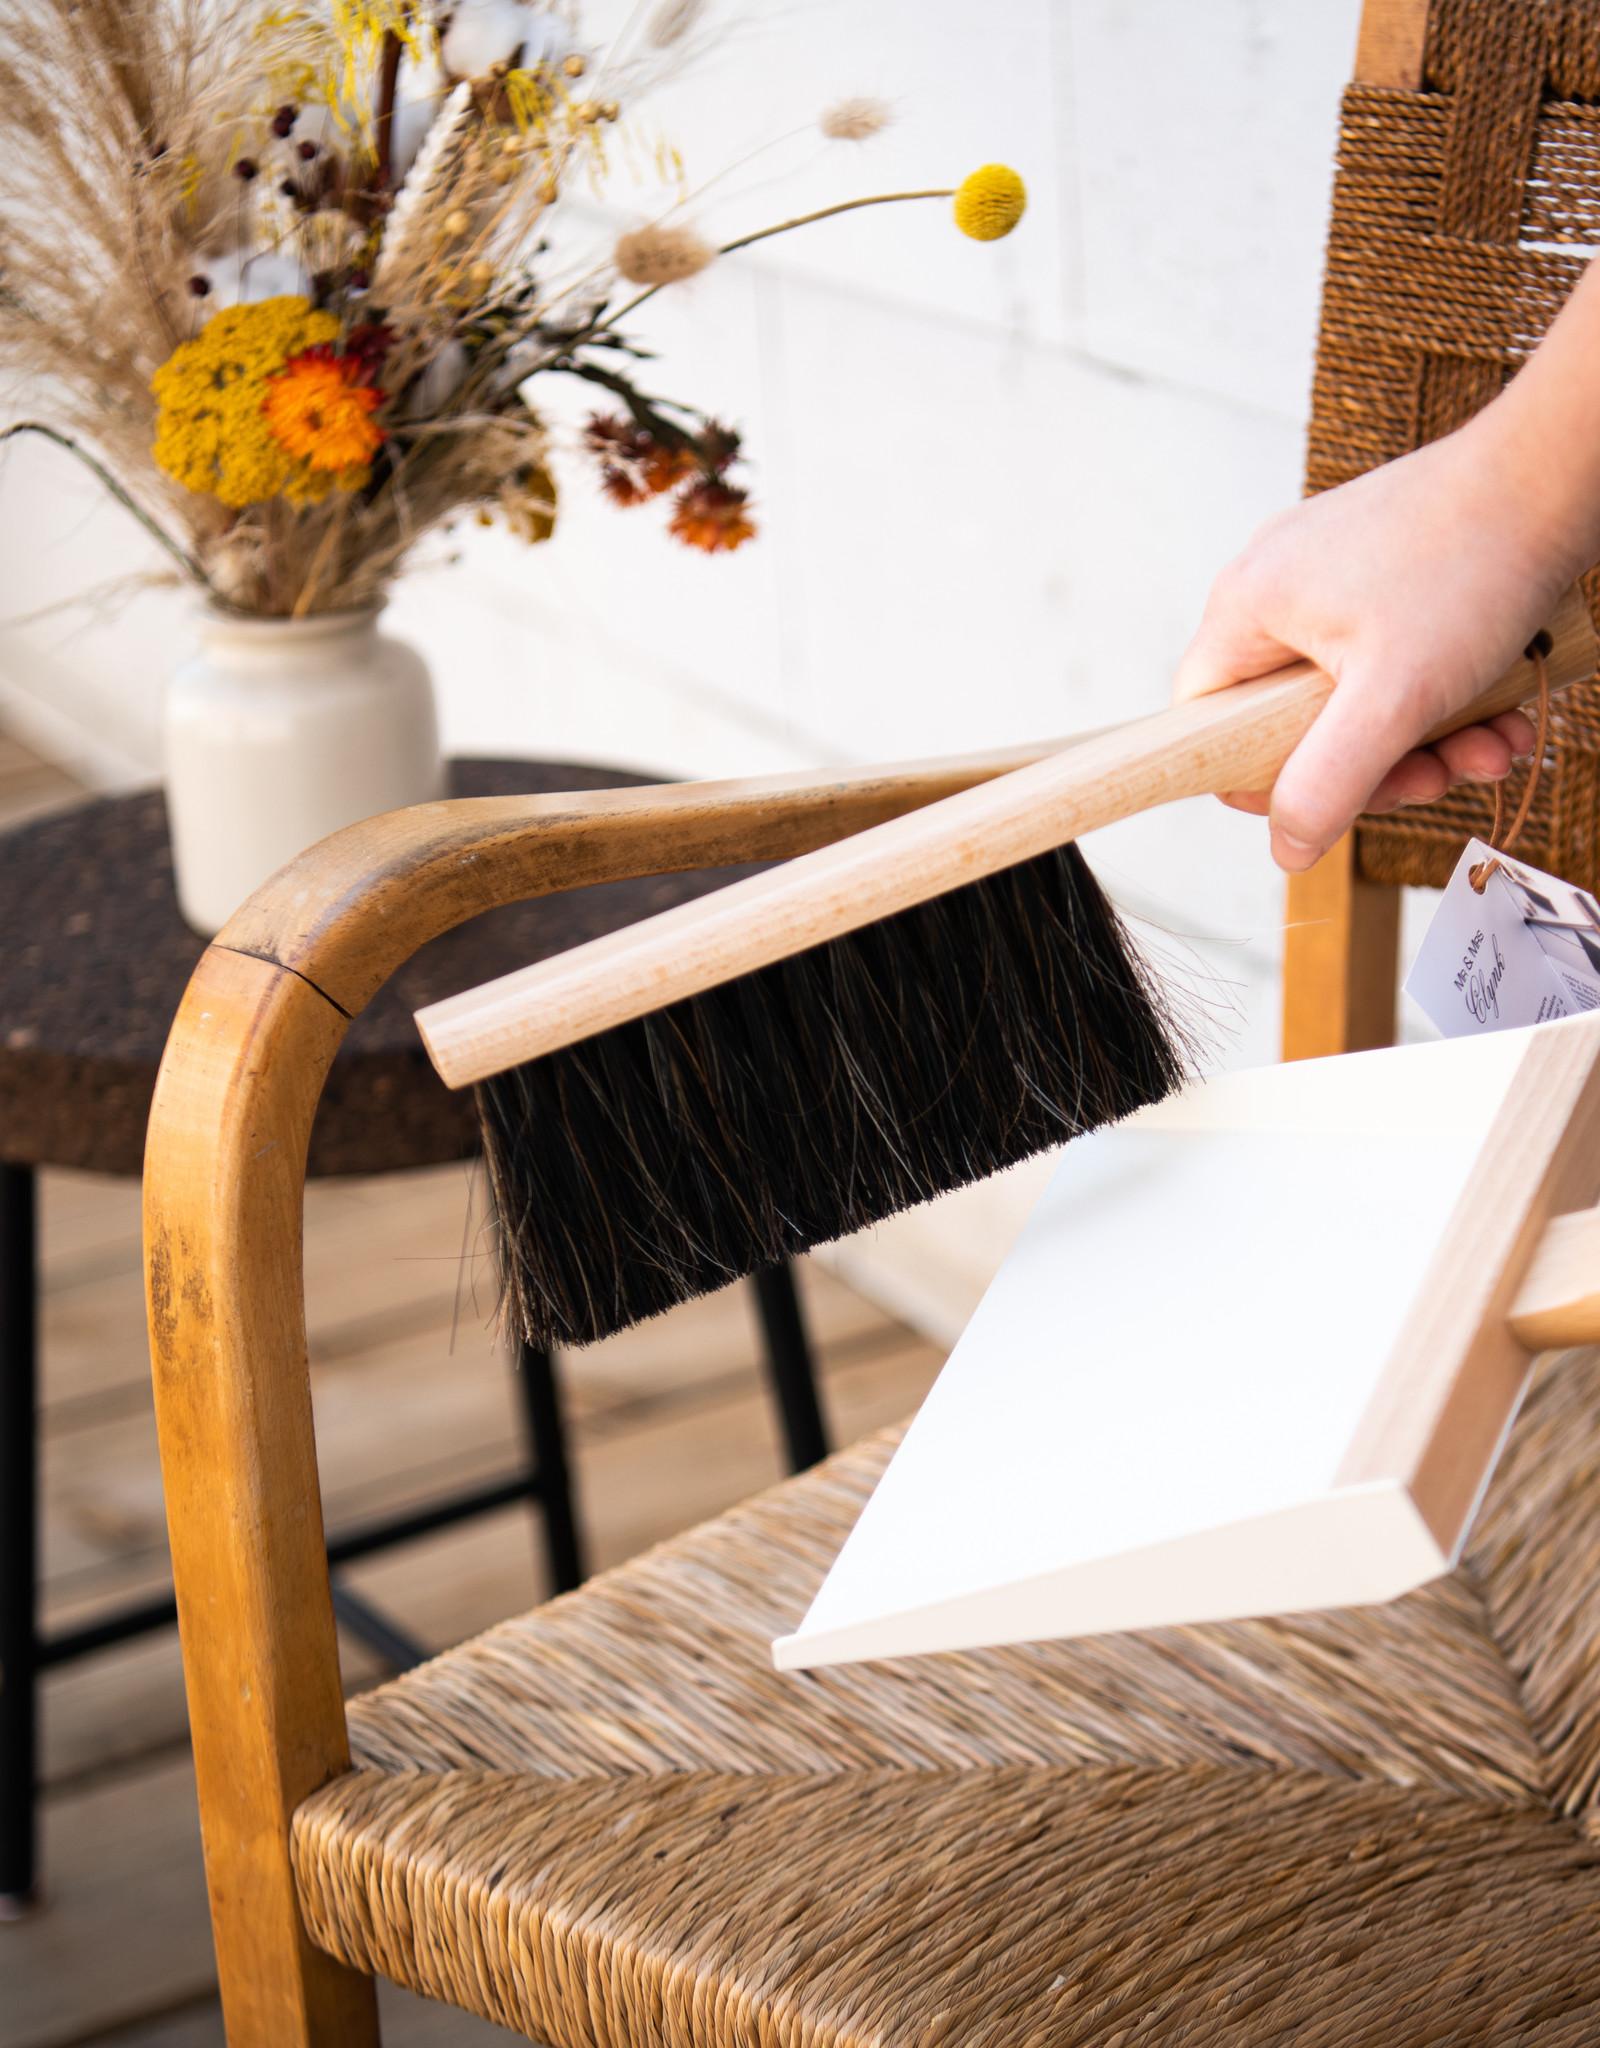 Andrée Jardin Hand broom and dustpan